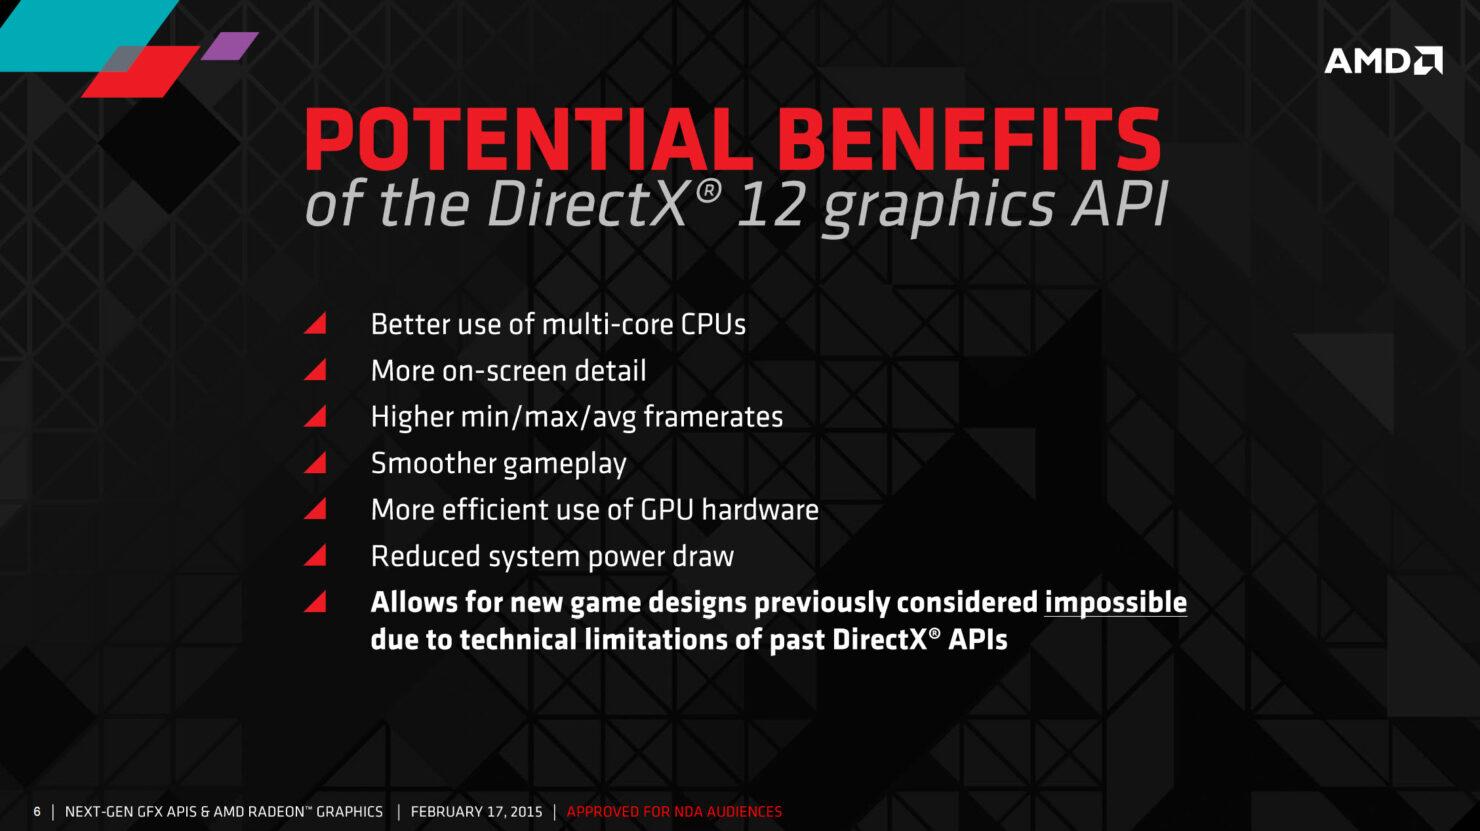 amd-directx-12-api-benefits